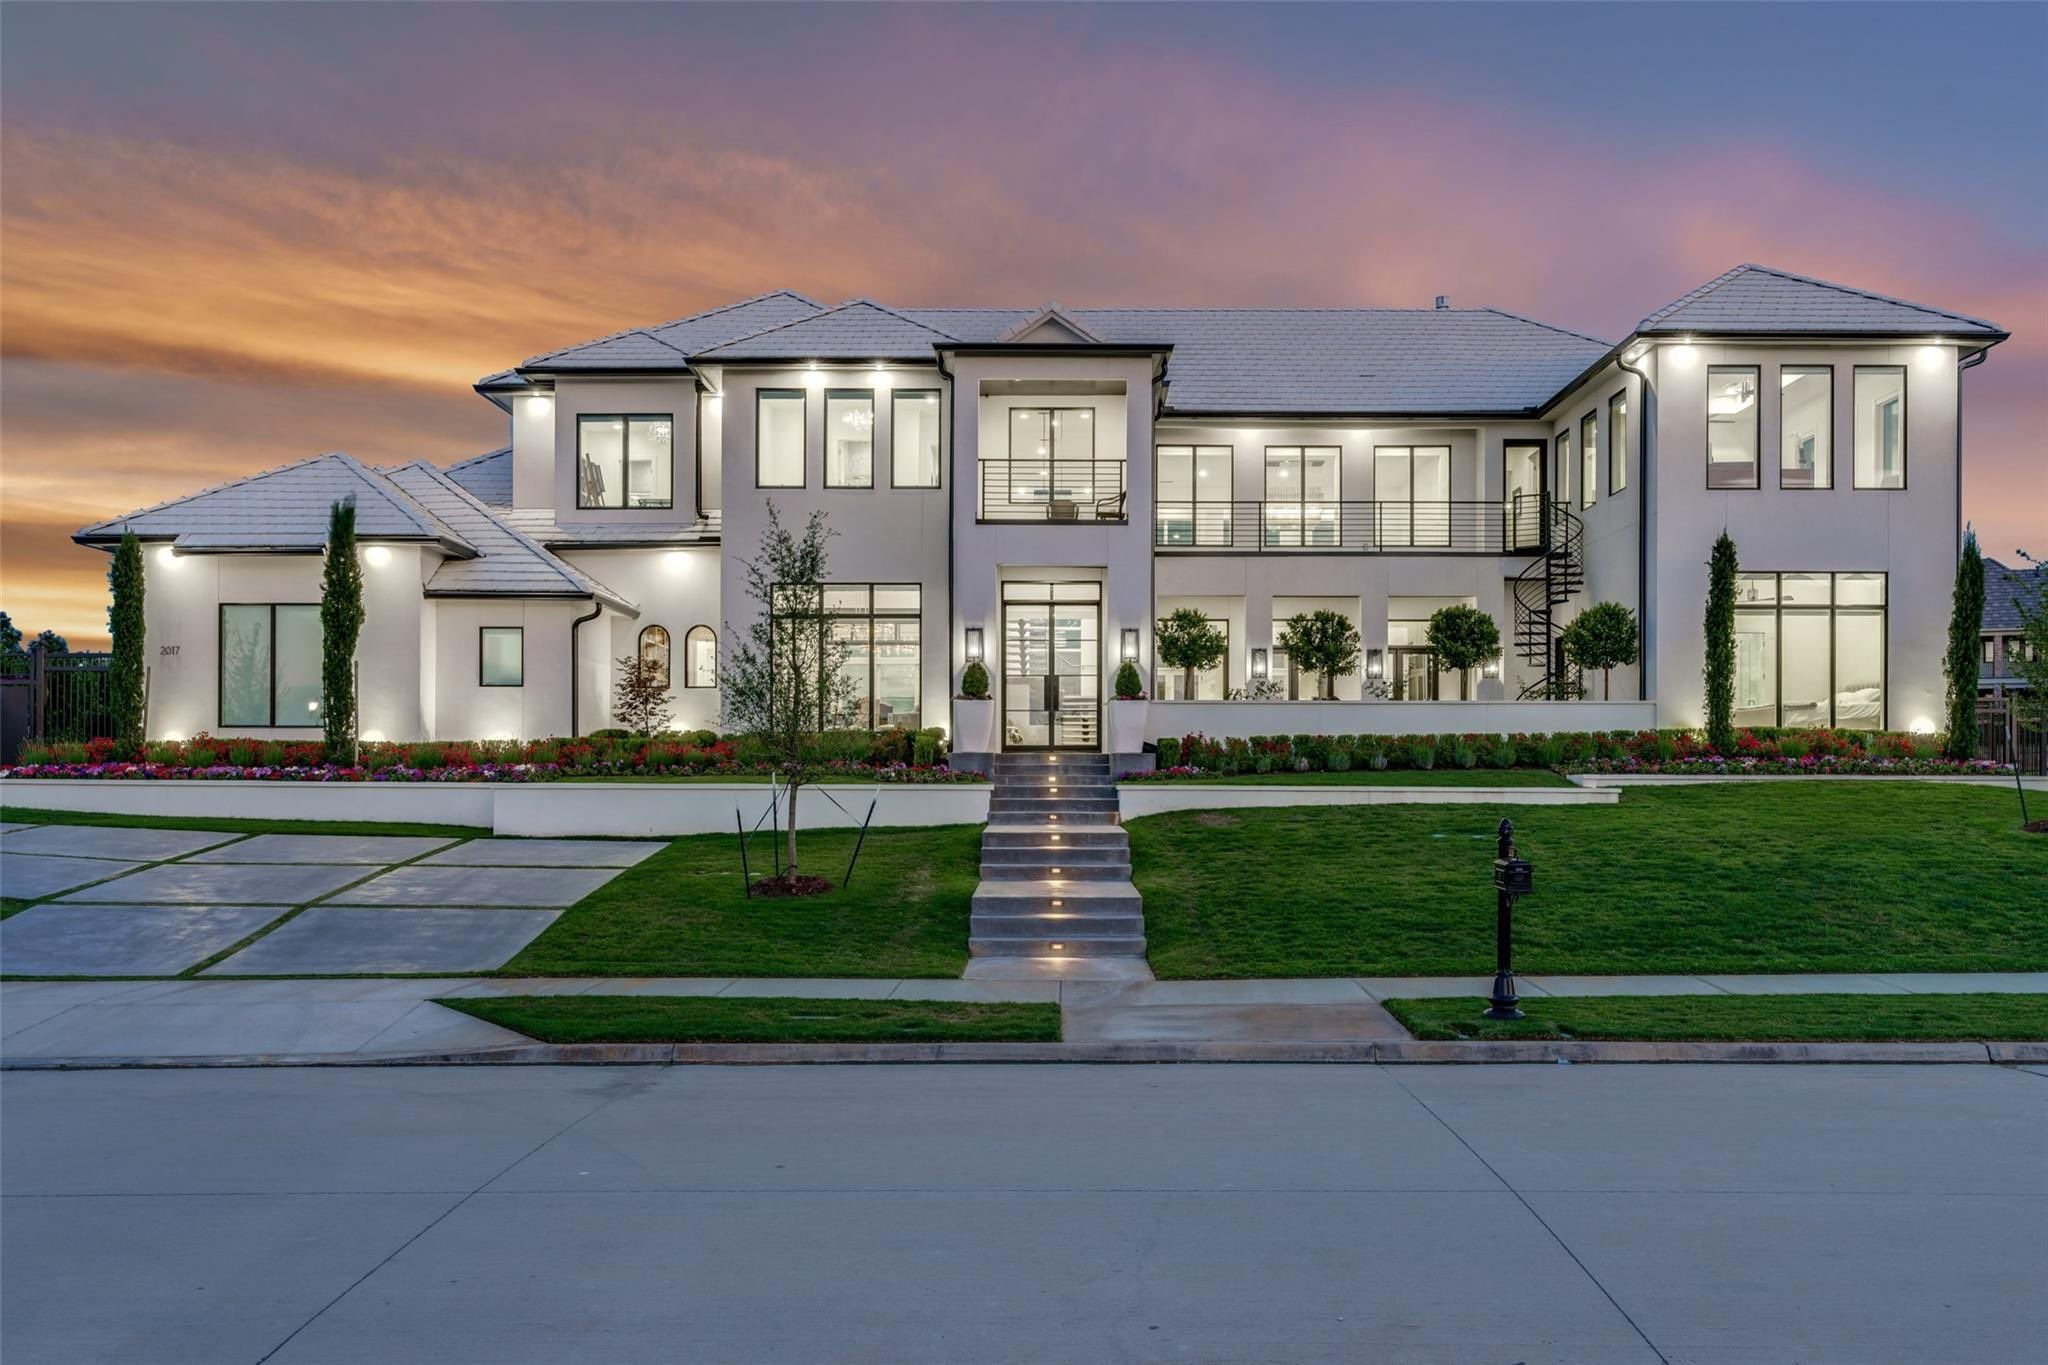 Ben Wegmann On Twitter Luxury Homes Dream Houses Dream House Exterior Modern House Exterior